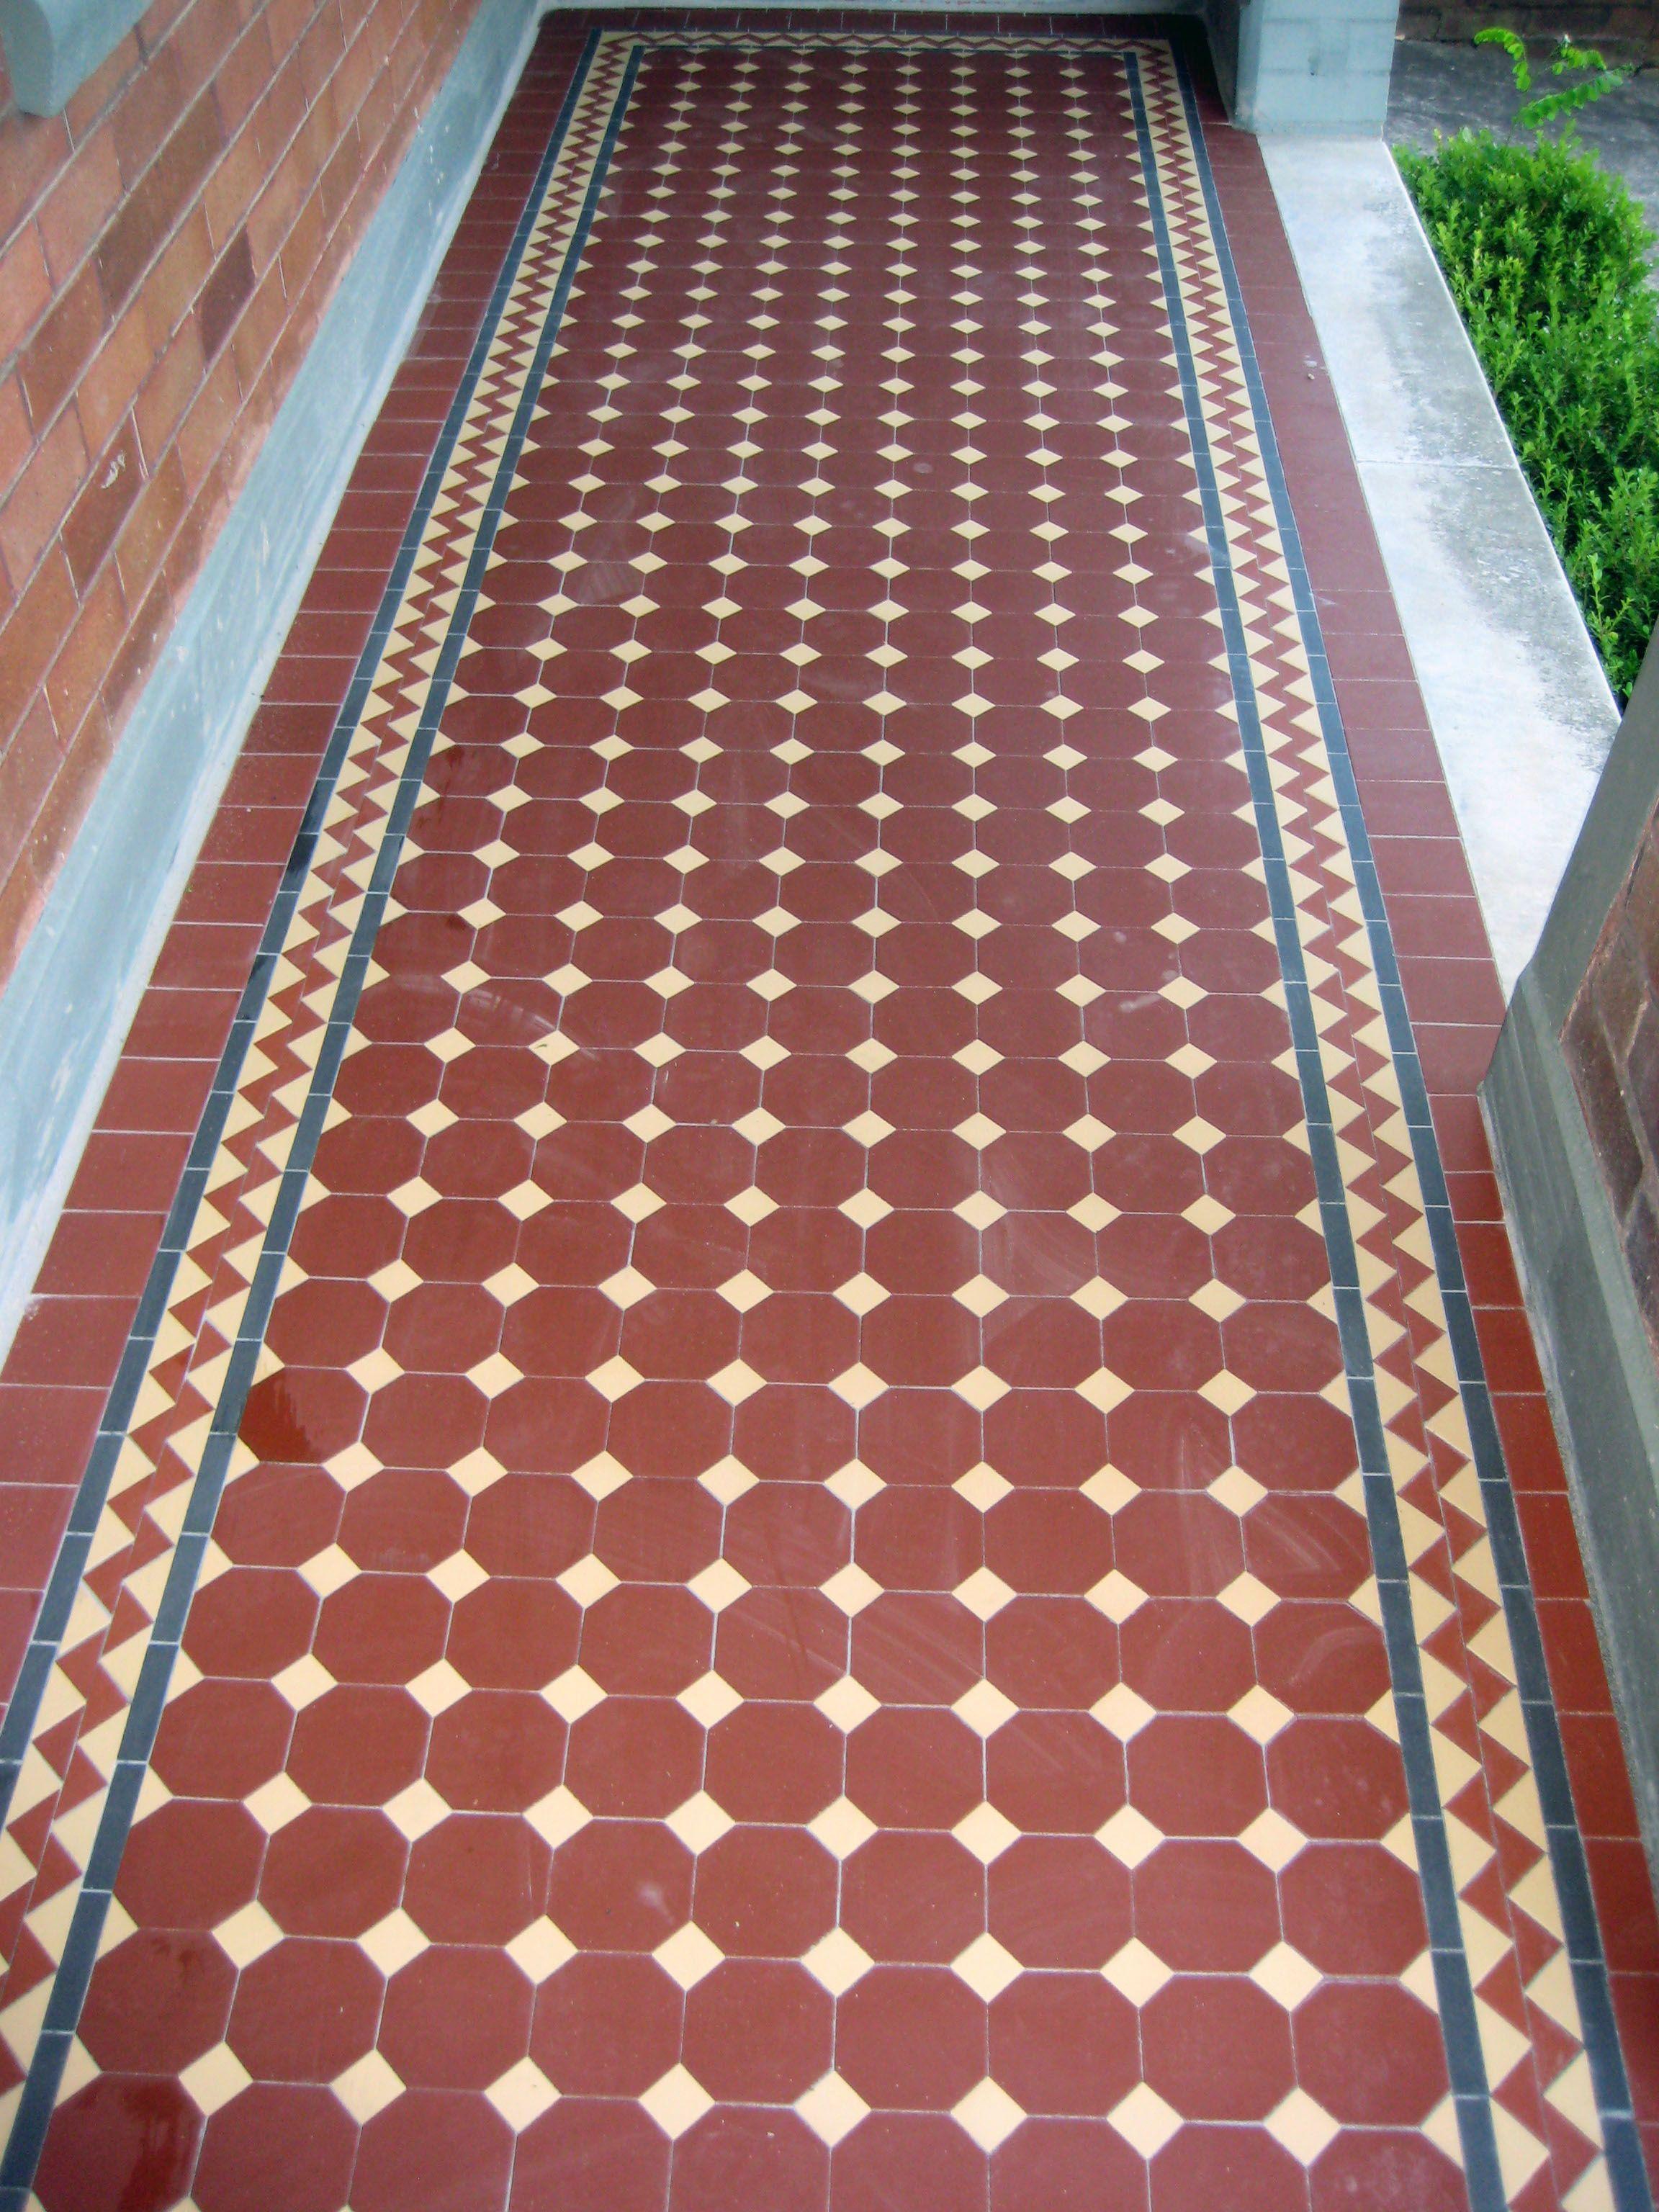 Pin By Muthu Krish On Tessellated Tiles Verandahs Brick Texture Victorian Tiles Hall Flooring